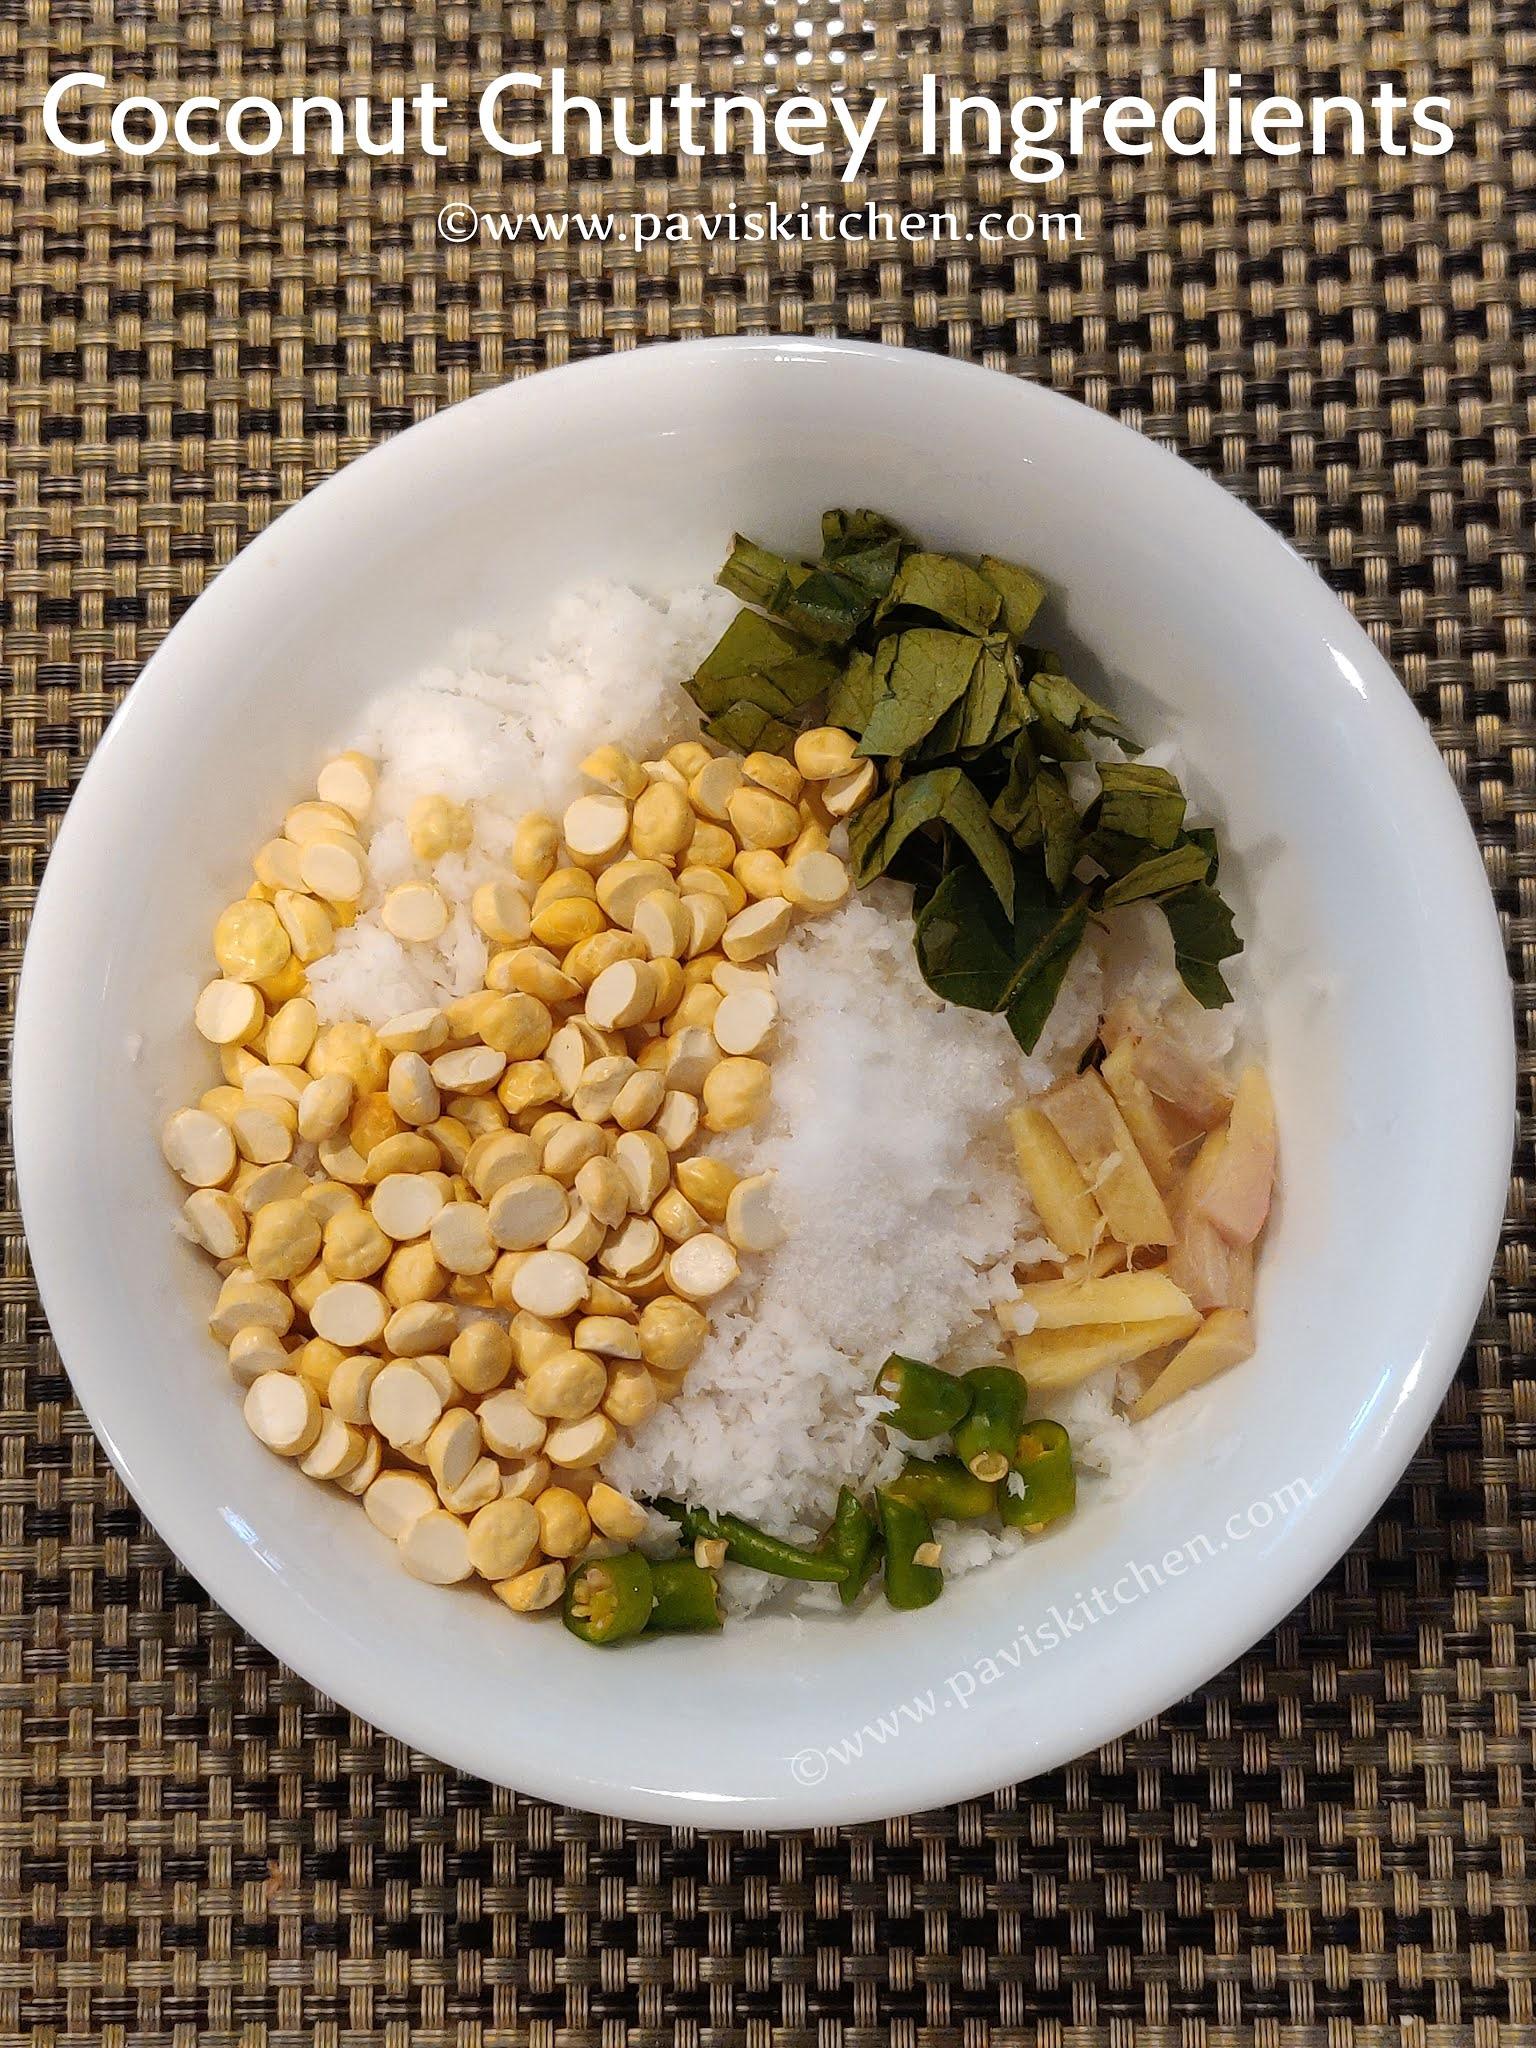 How to make coconut chutney recipe | Thengai chutney | Nariyal chutney recipe | Kobbari chutney recipe